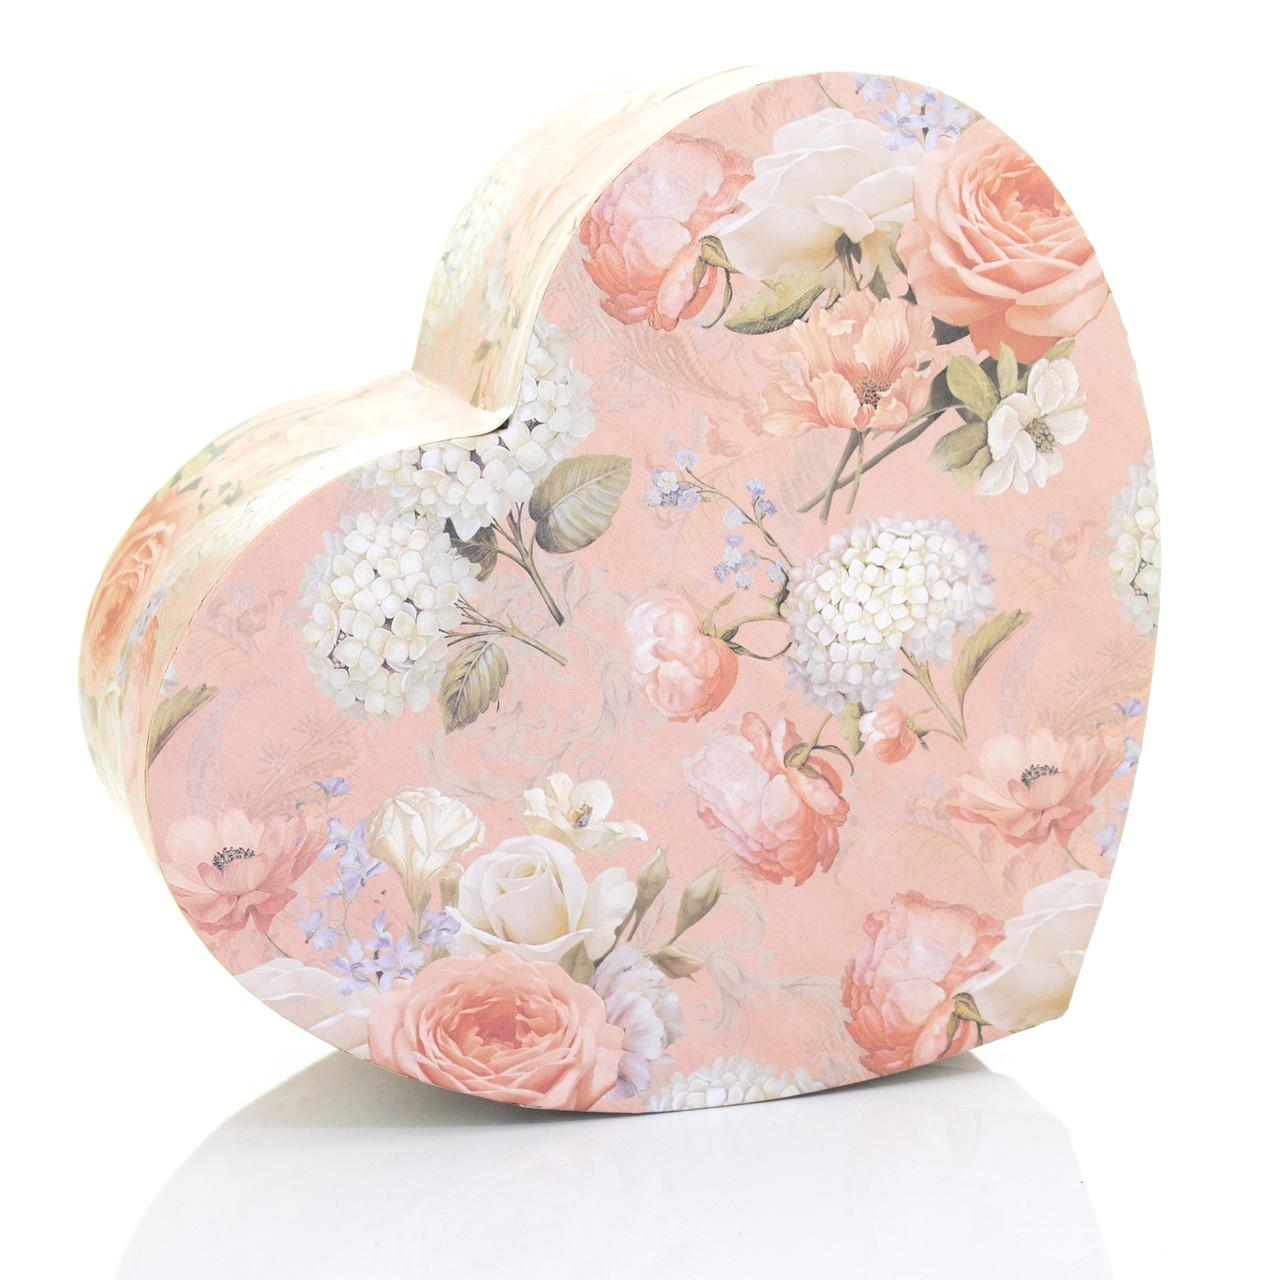 Подарочная коробка сердце персиковая с розами 22.5 x 19.5 x 9.5 см